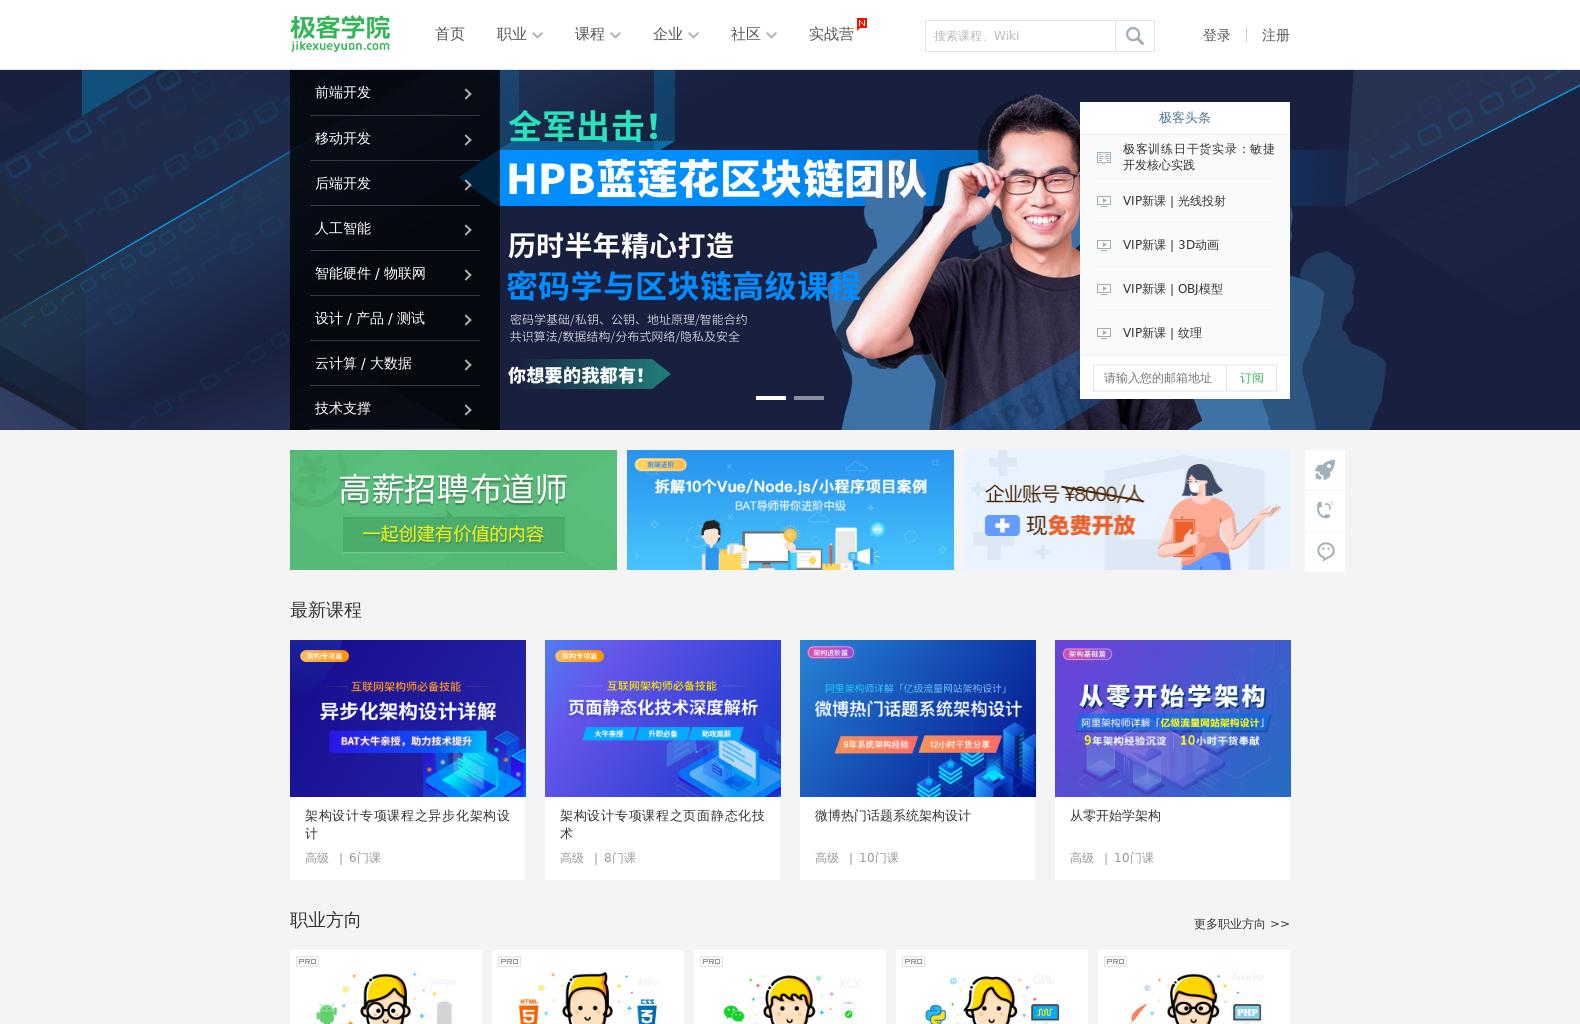 www.jikexueyuan.com的网站截图